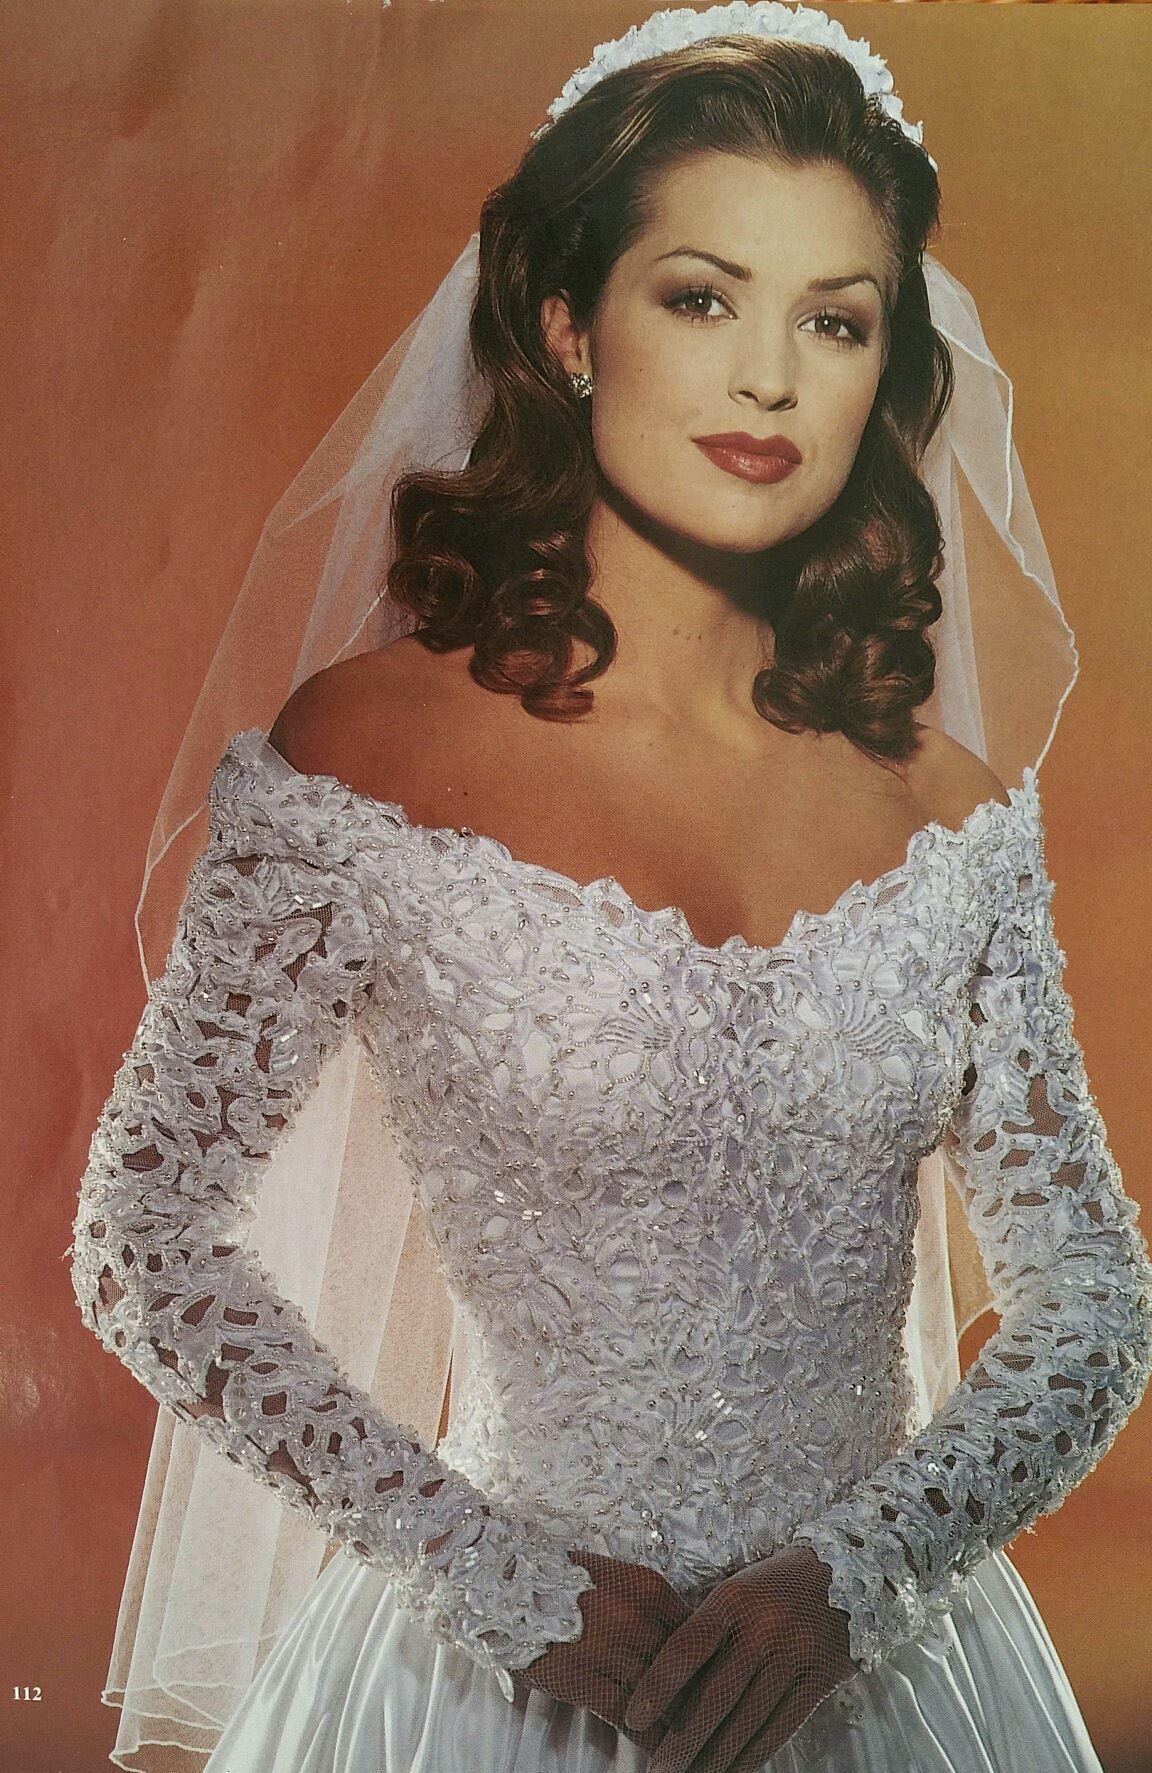 Pin by leslie fung on wedding dresses pinterest wedding dresses